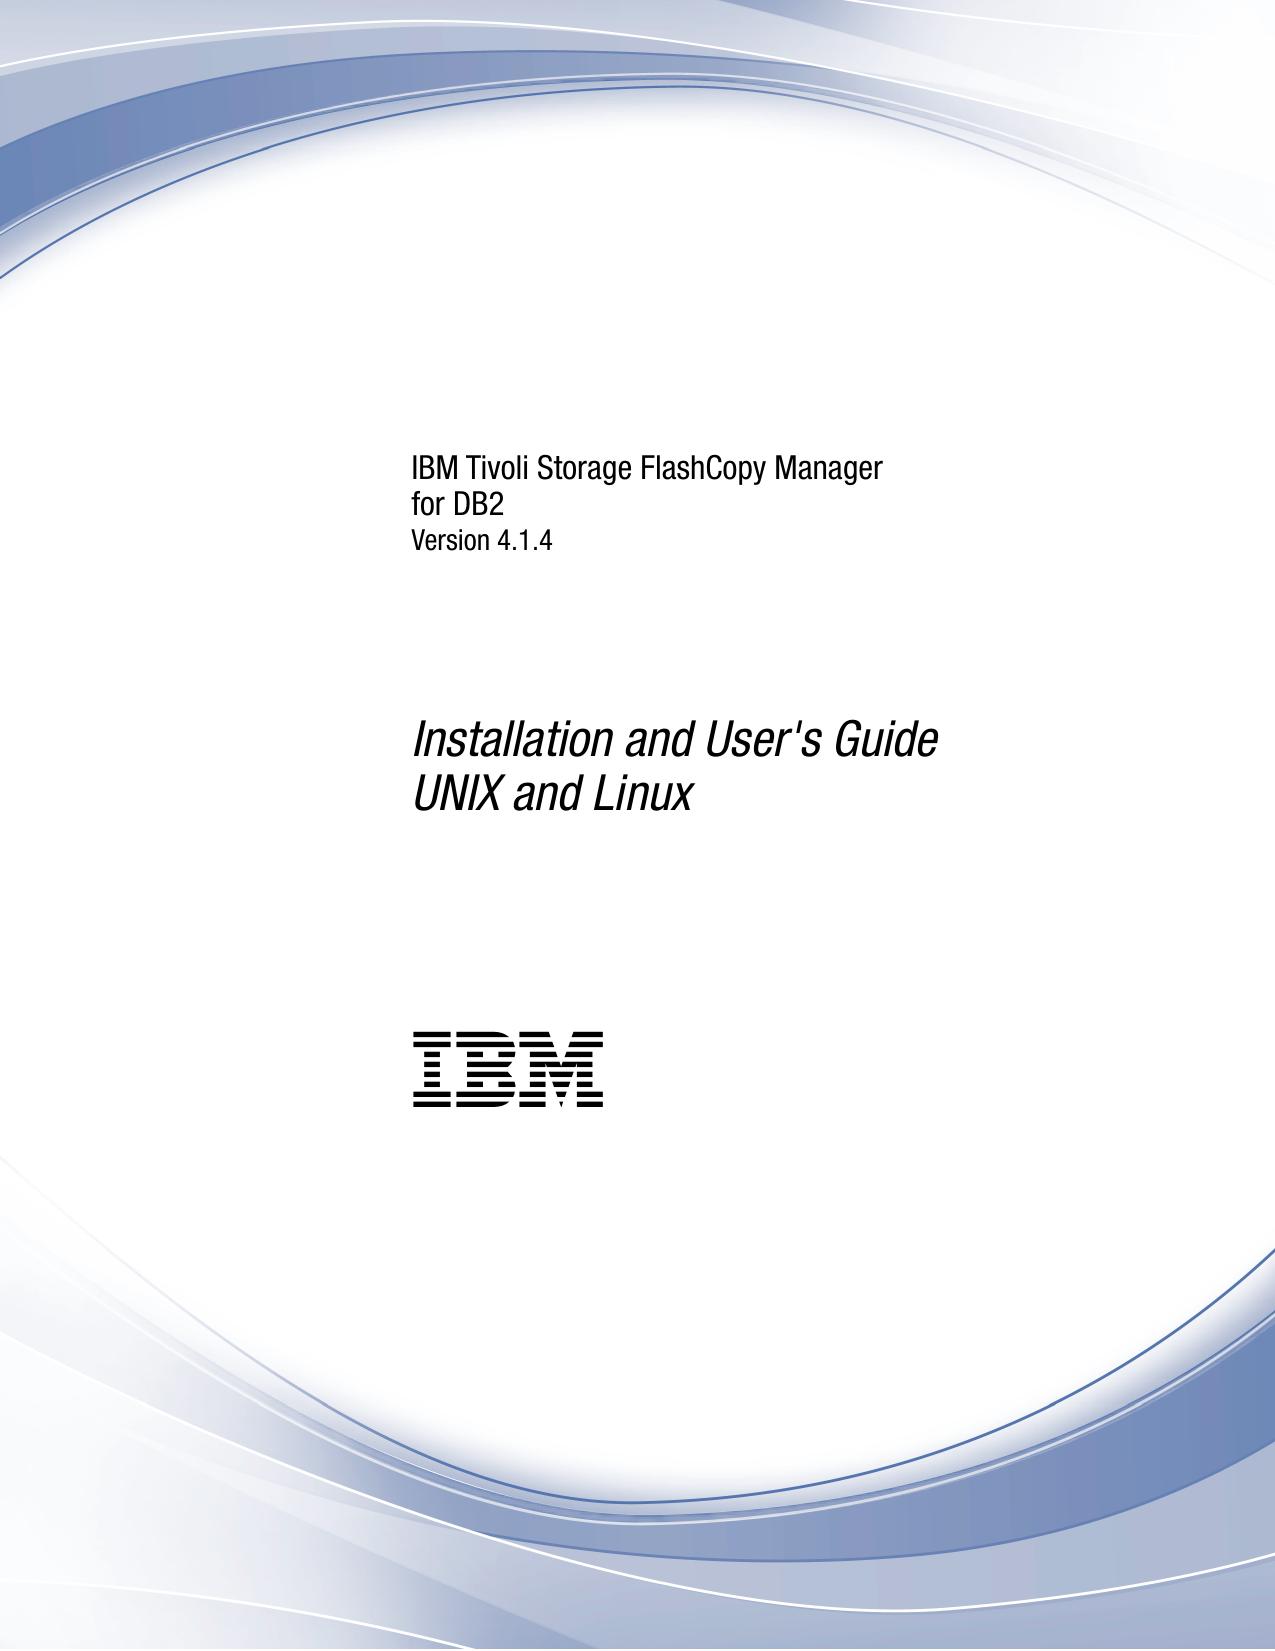 IBM Tivoli Storage FlashCopy Manager for DB2: Installation